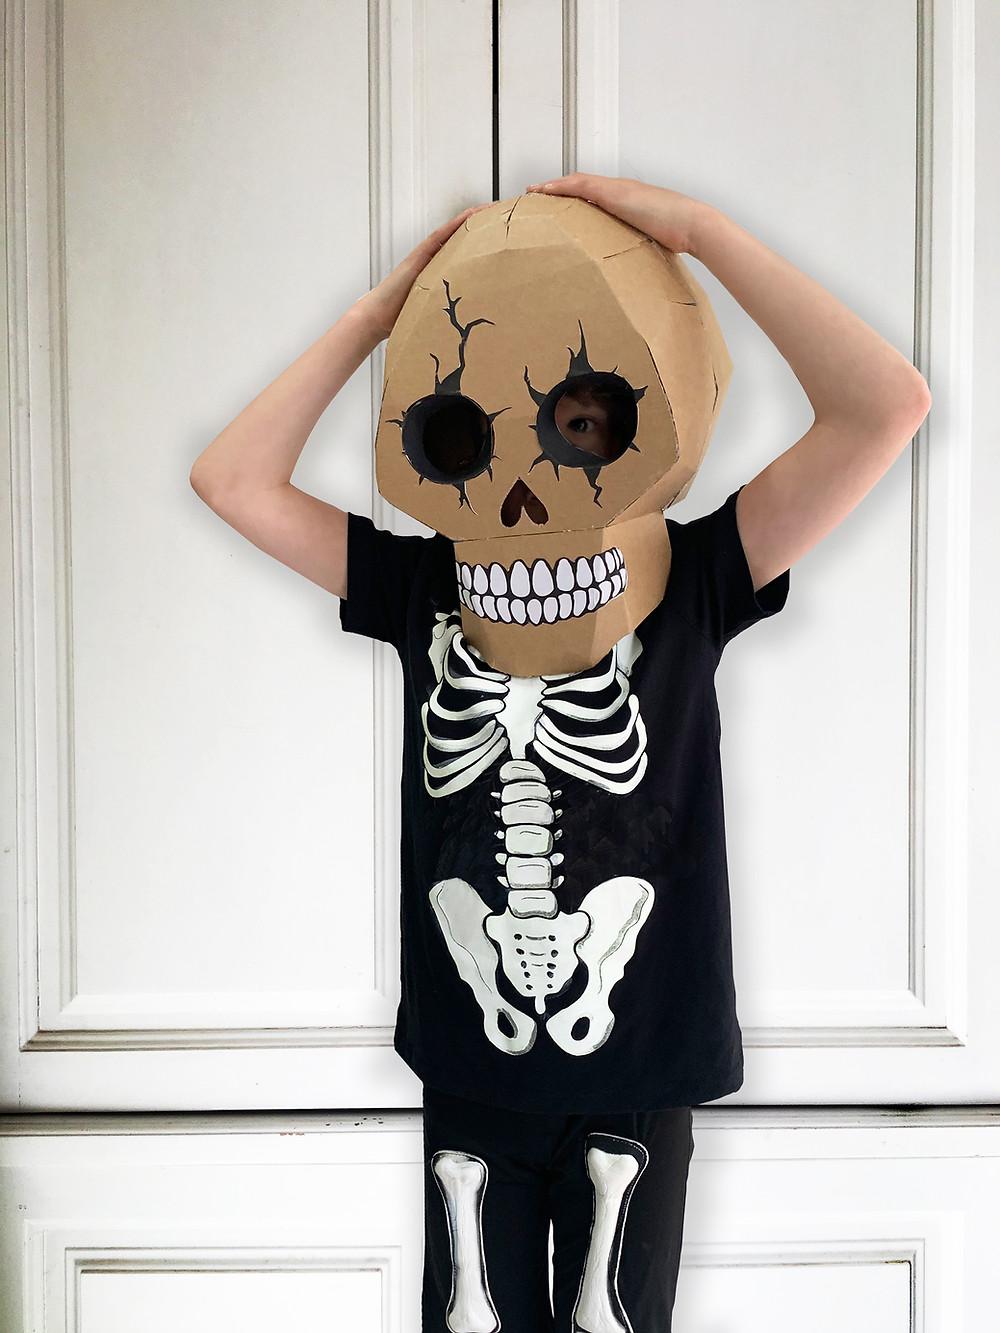 Scary cardboard skull costume for Halloween